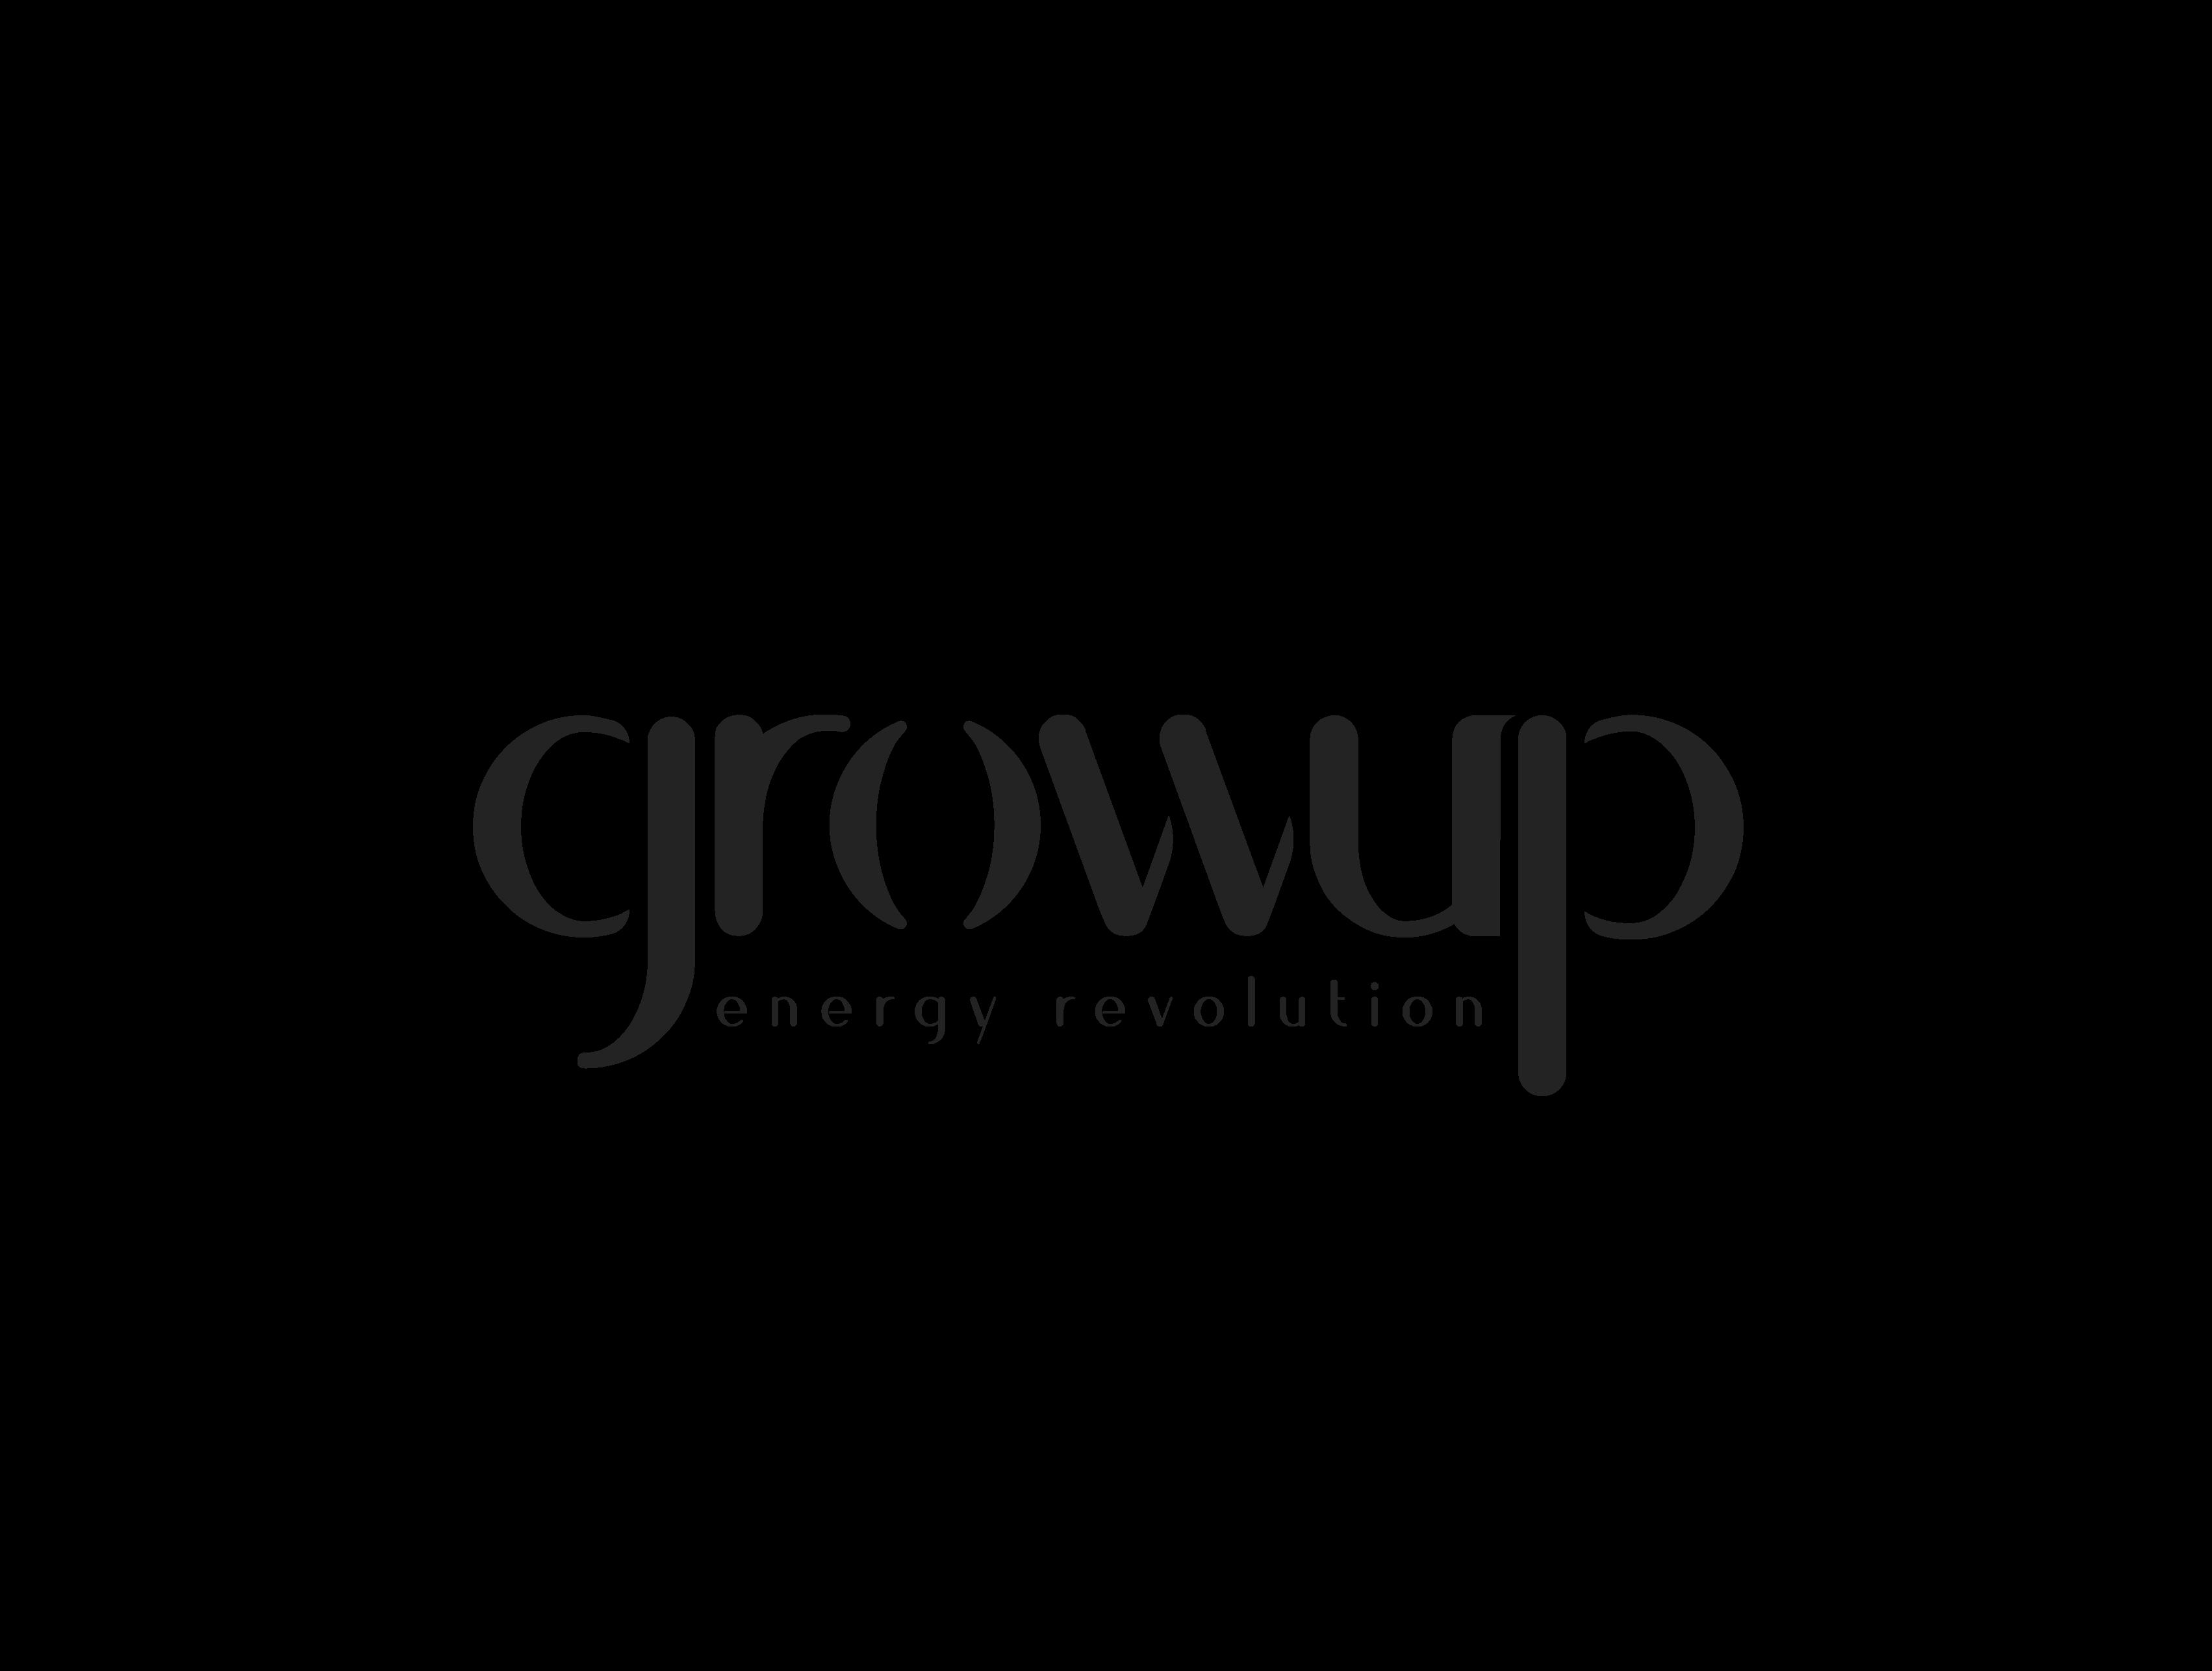 logo growup